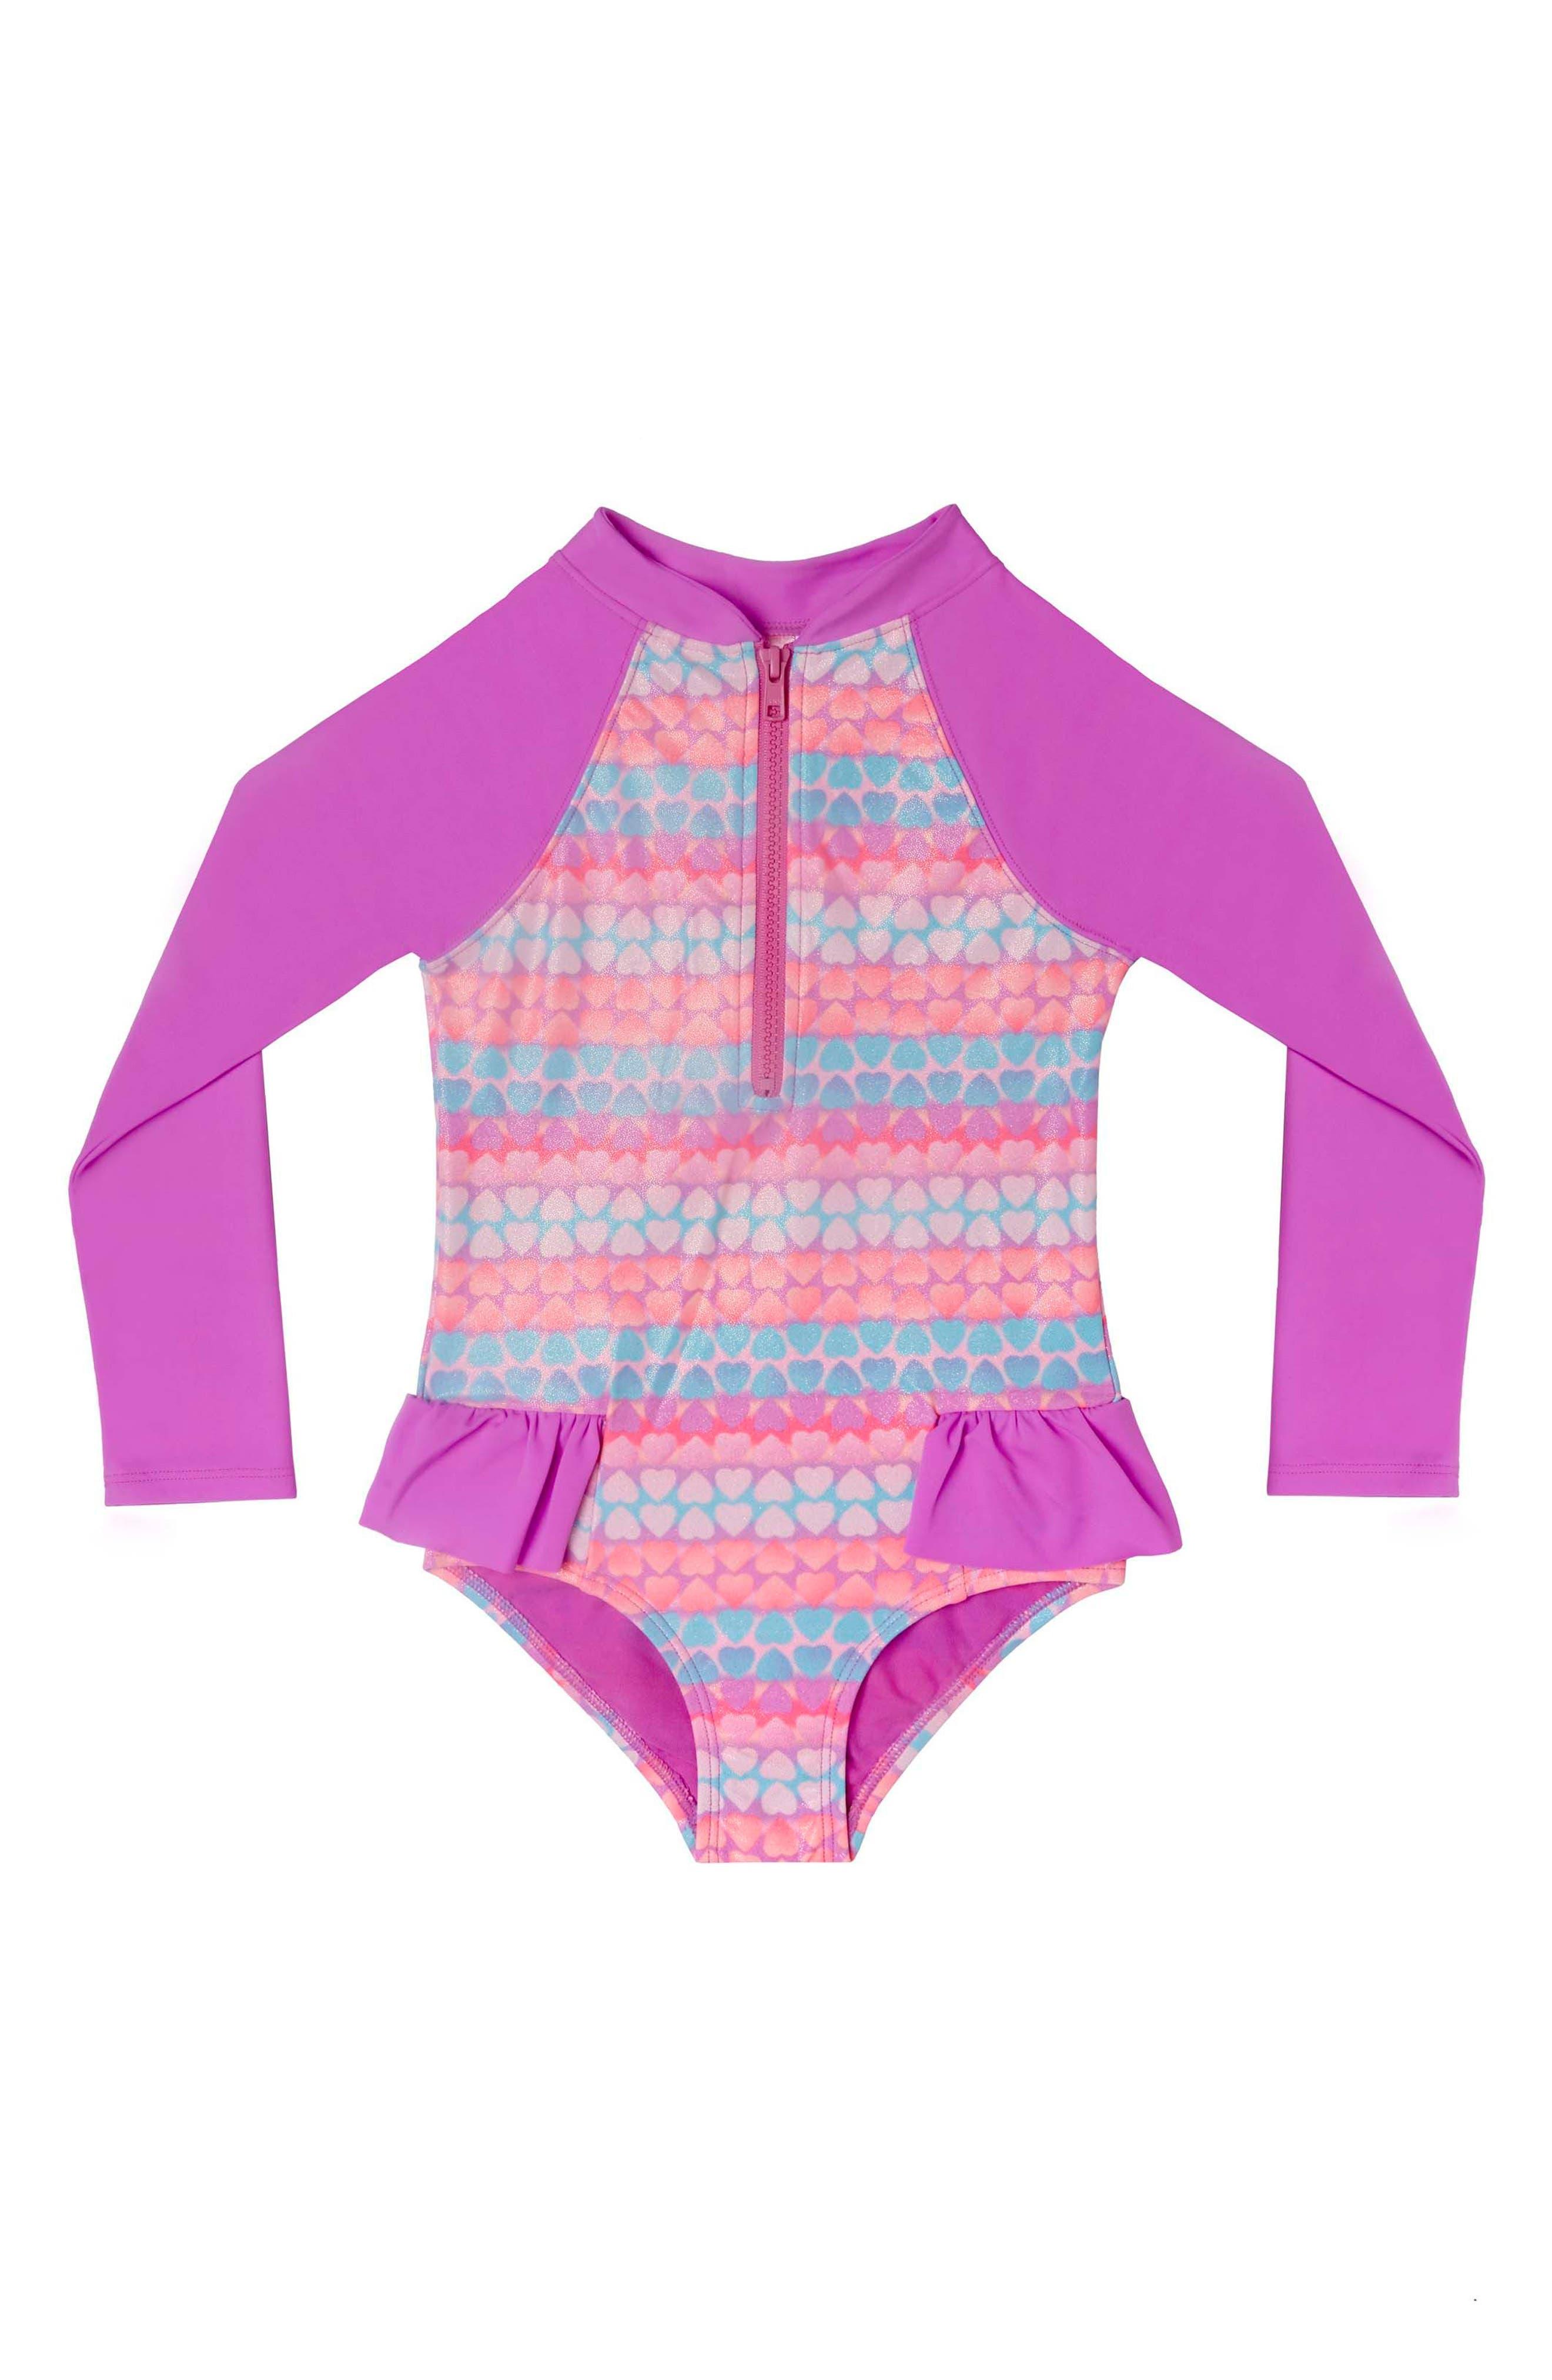 Hula Star Hearts Galore One-Piece Rashguard Swimsuit (Toddler Girls & Little Girls)